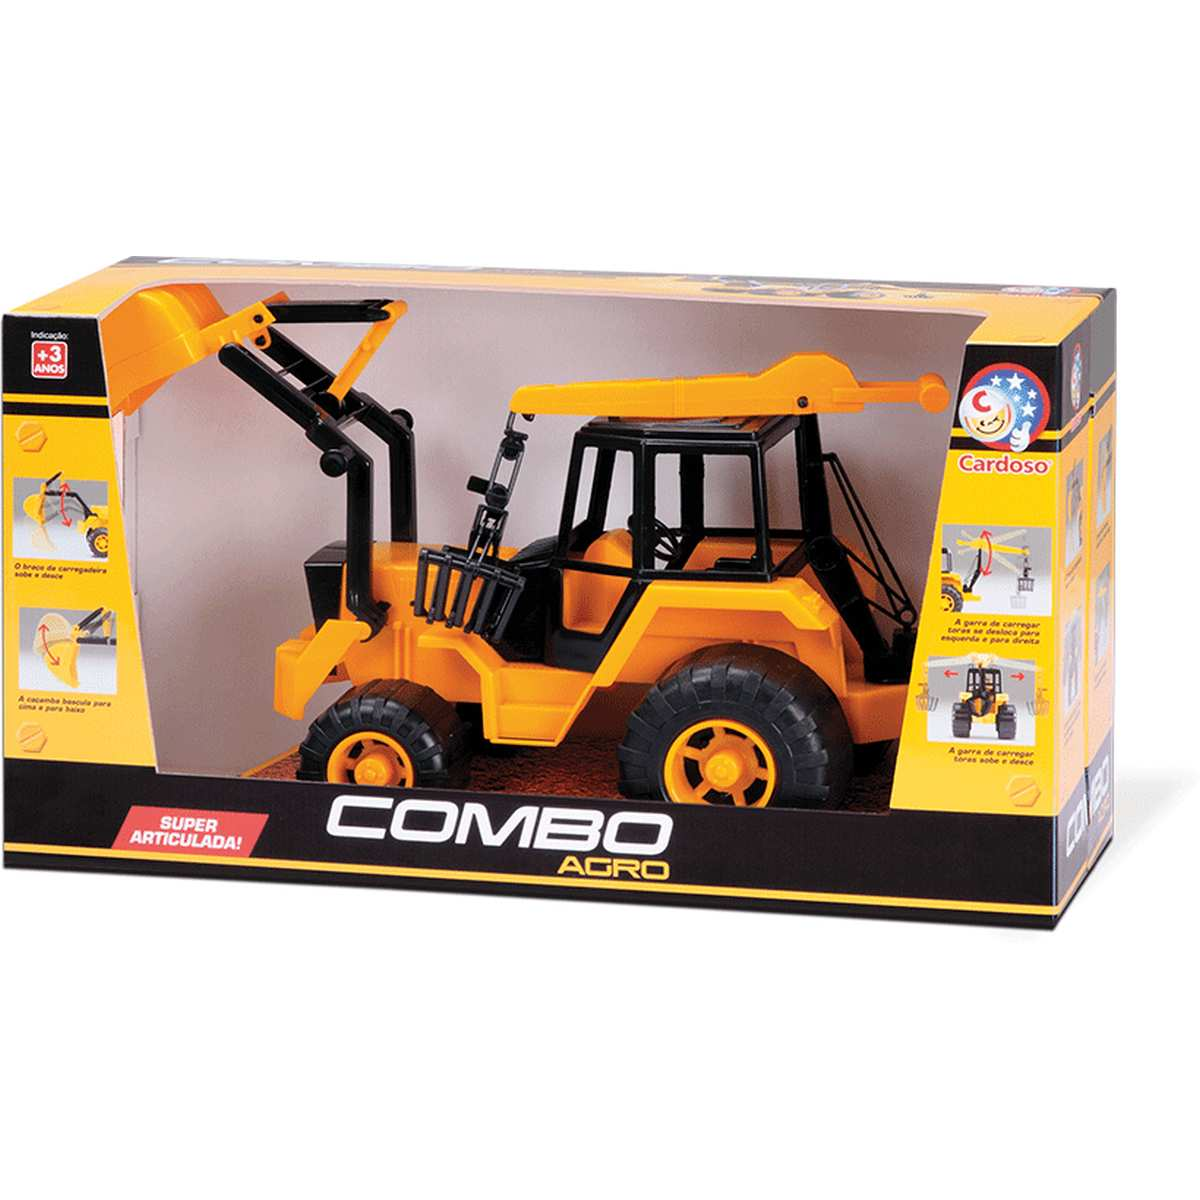 Trator | Combo Agro | Cardoso Toys